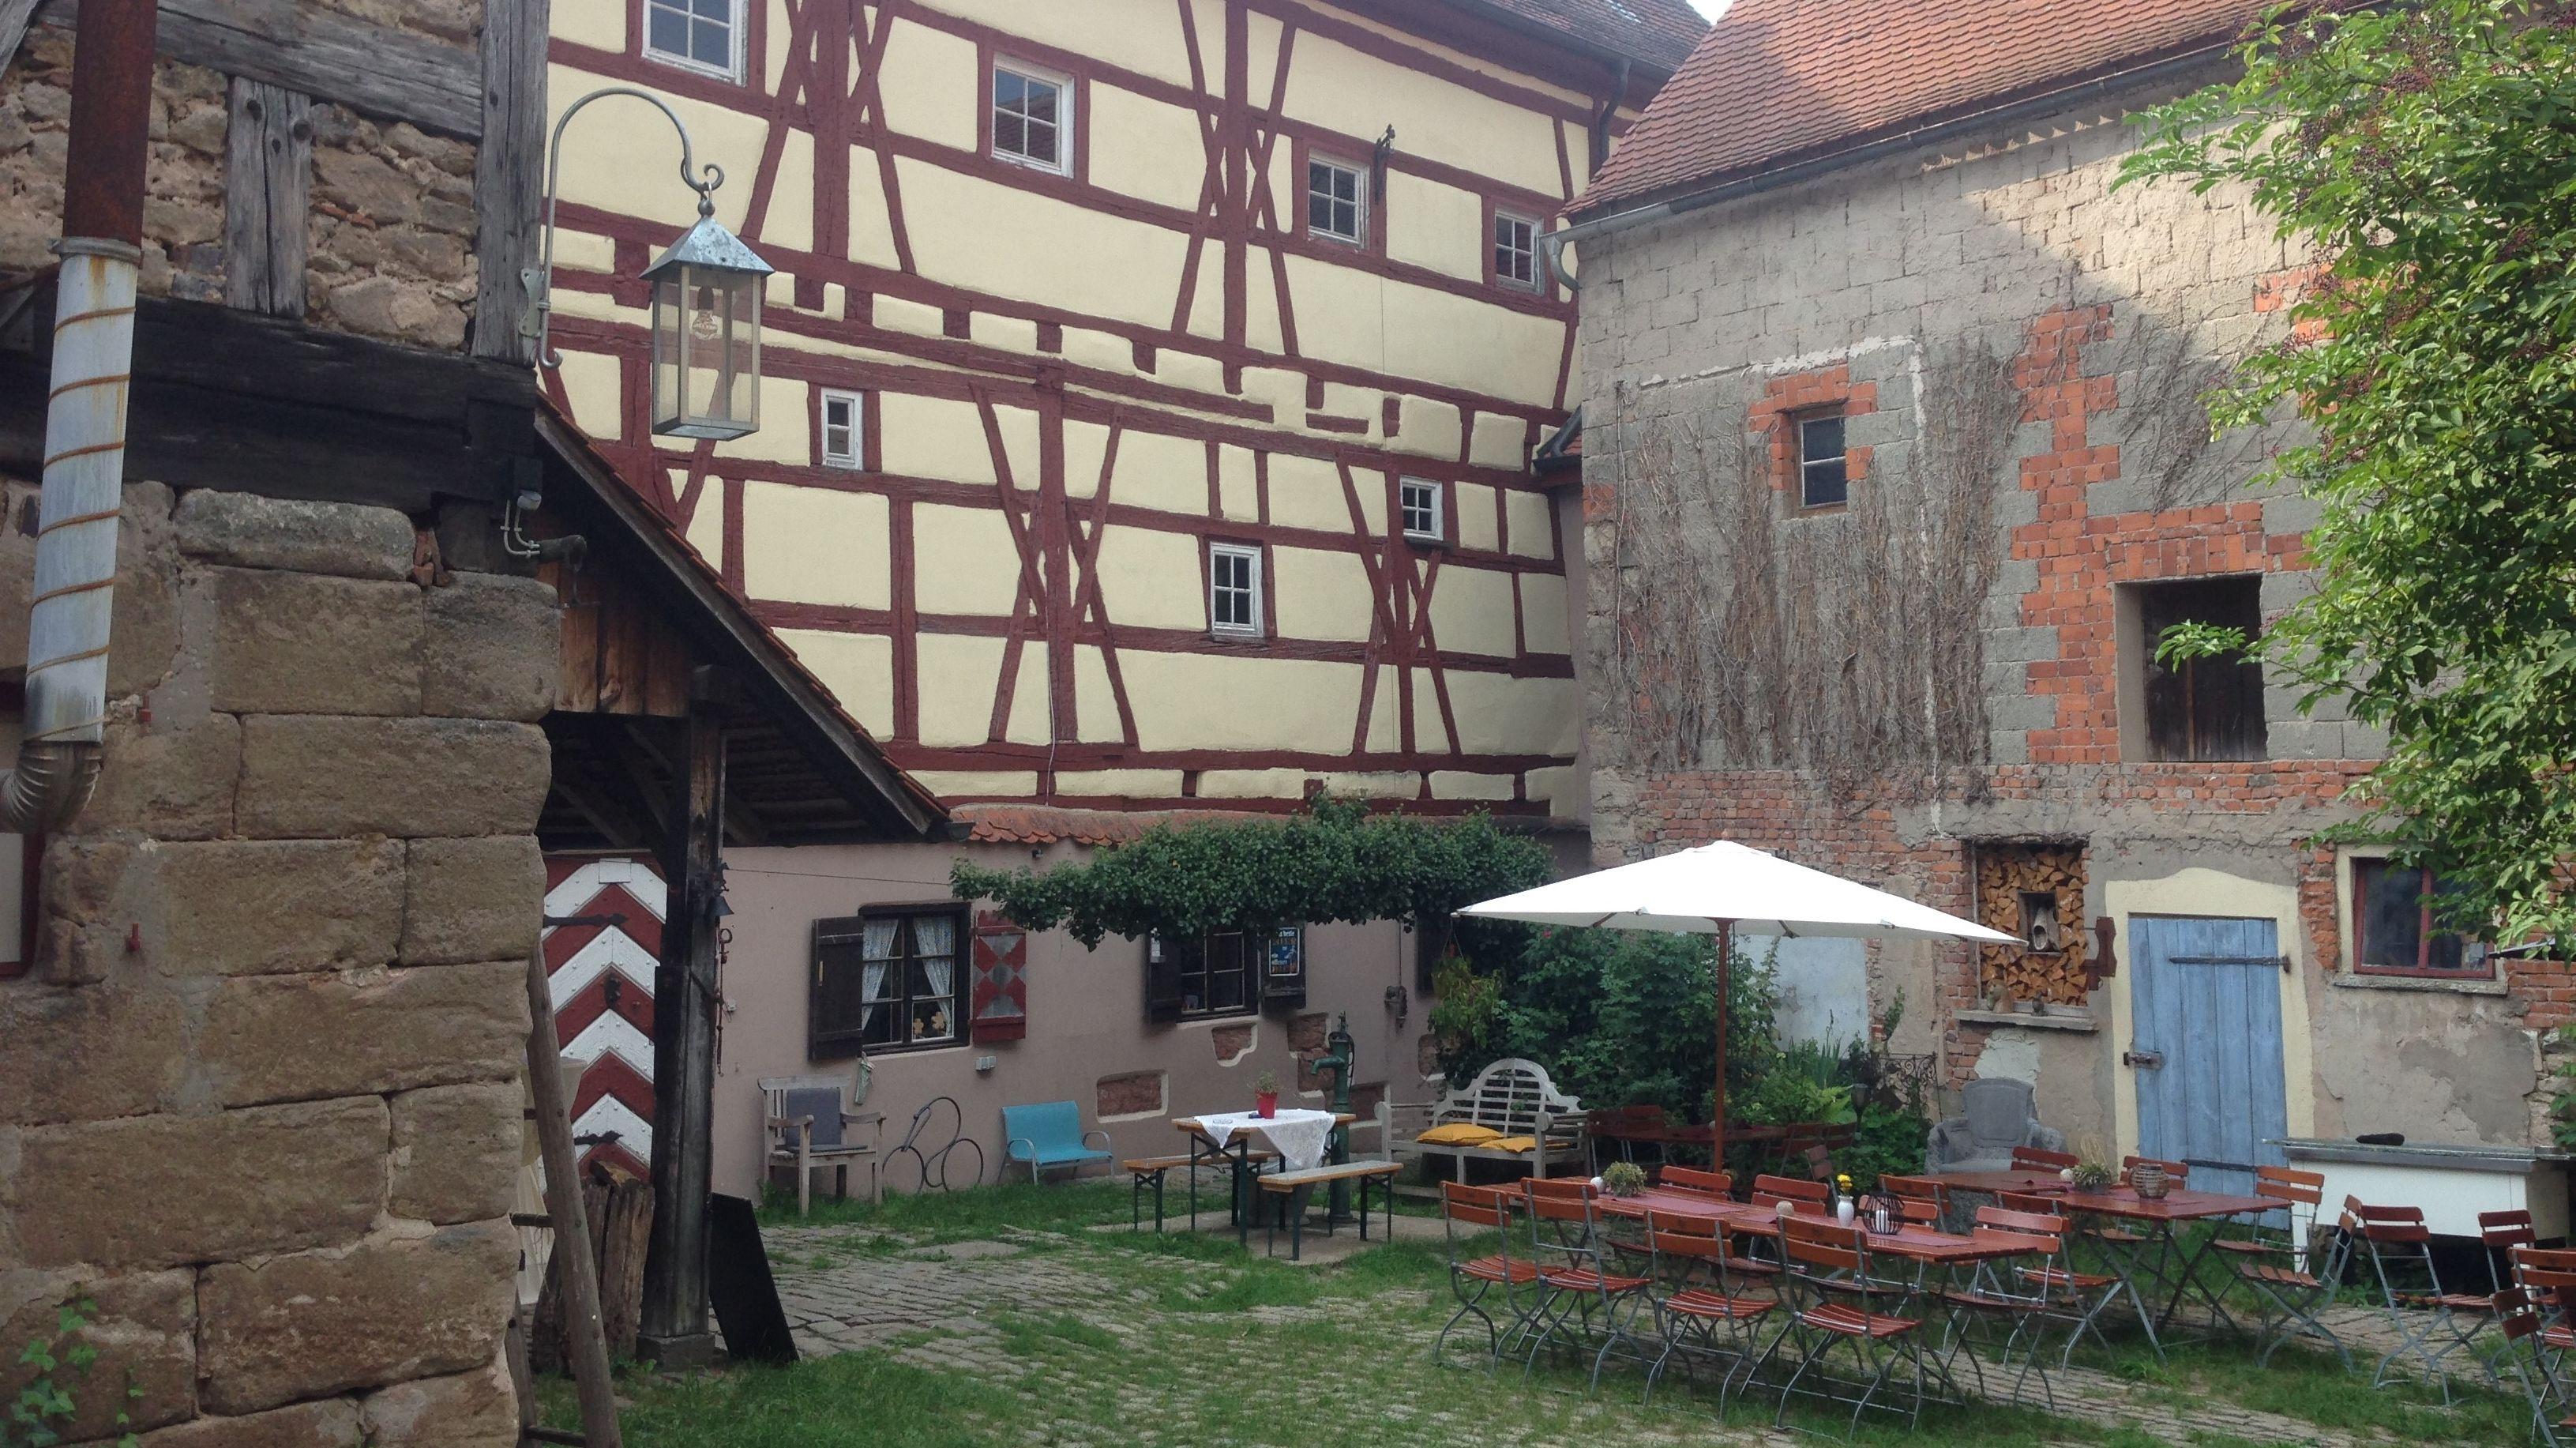 Innenhof von Schloss Eysölden